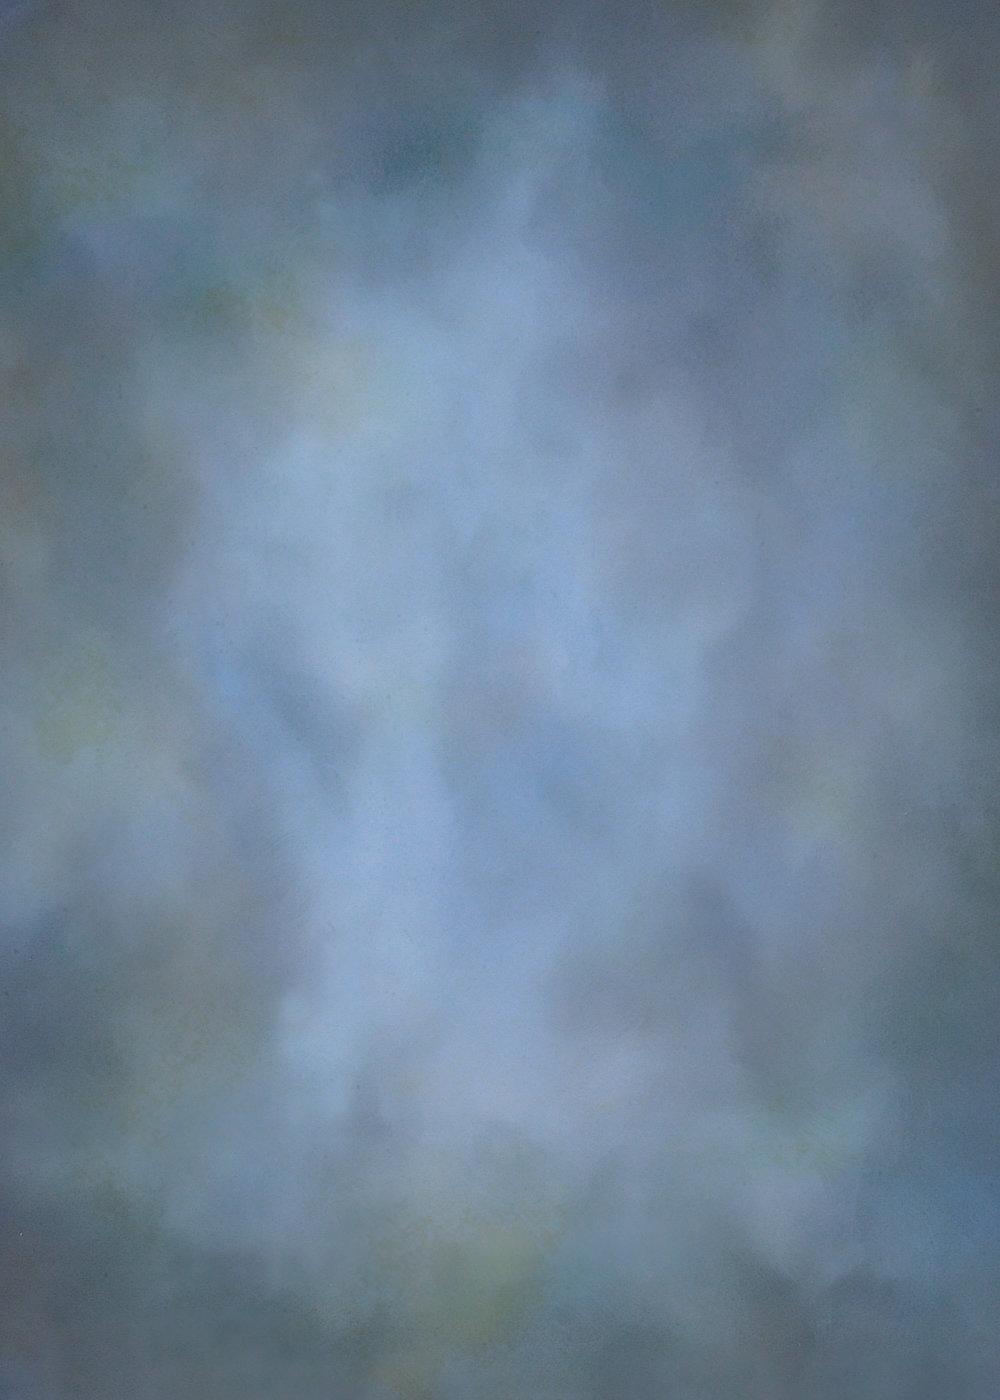 Kindergrad Background Blue - C